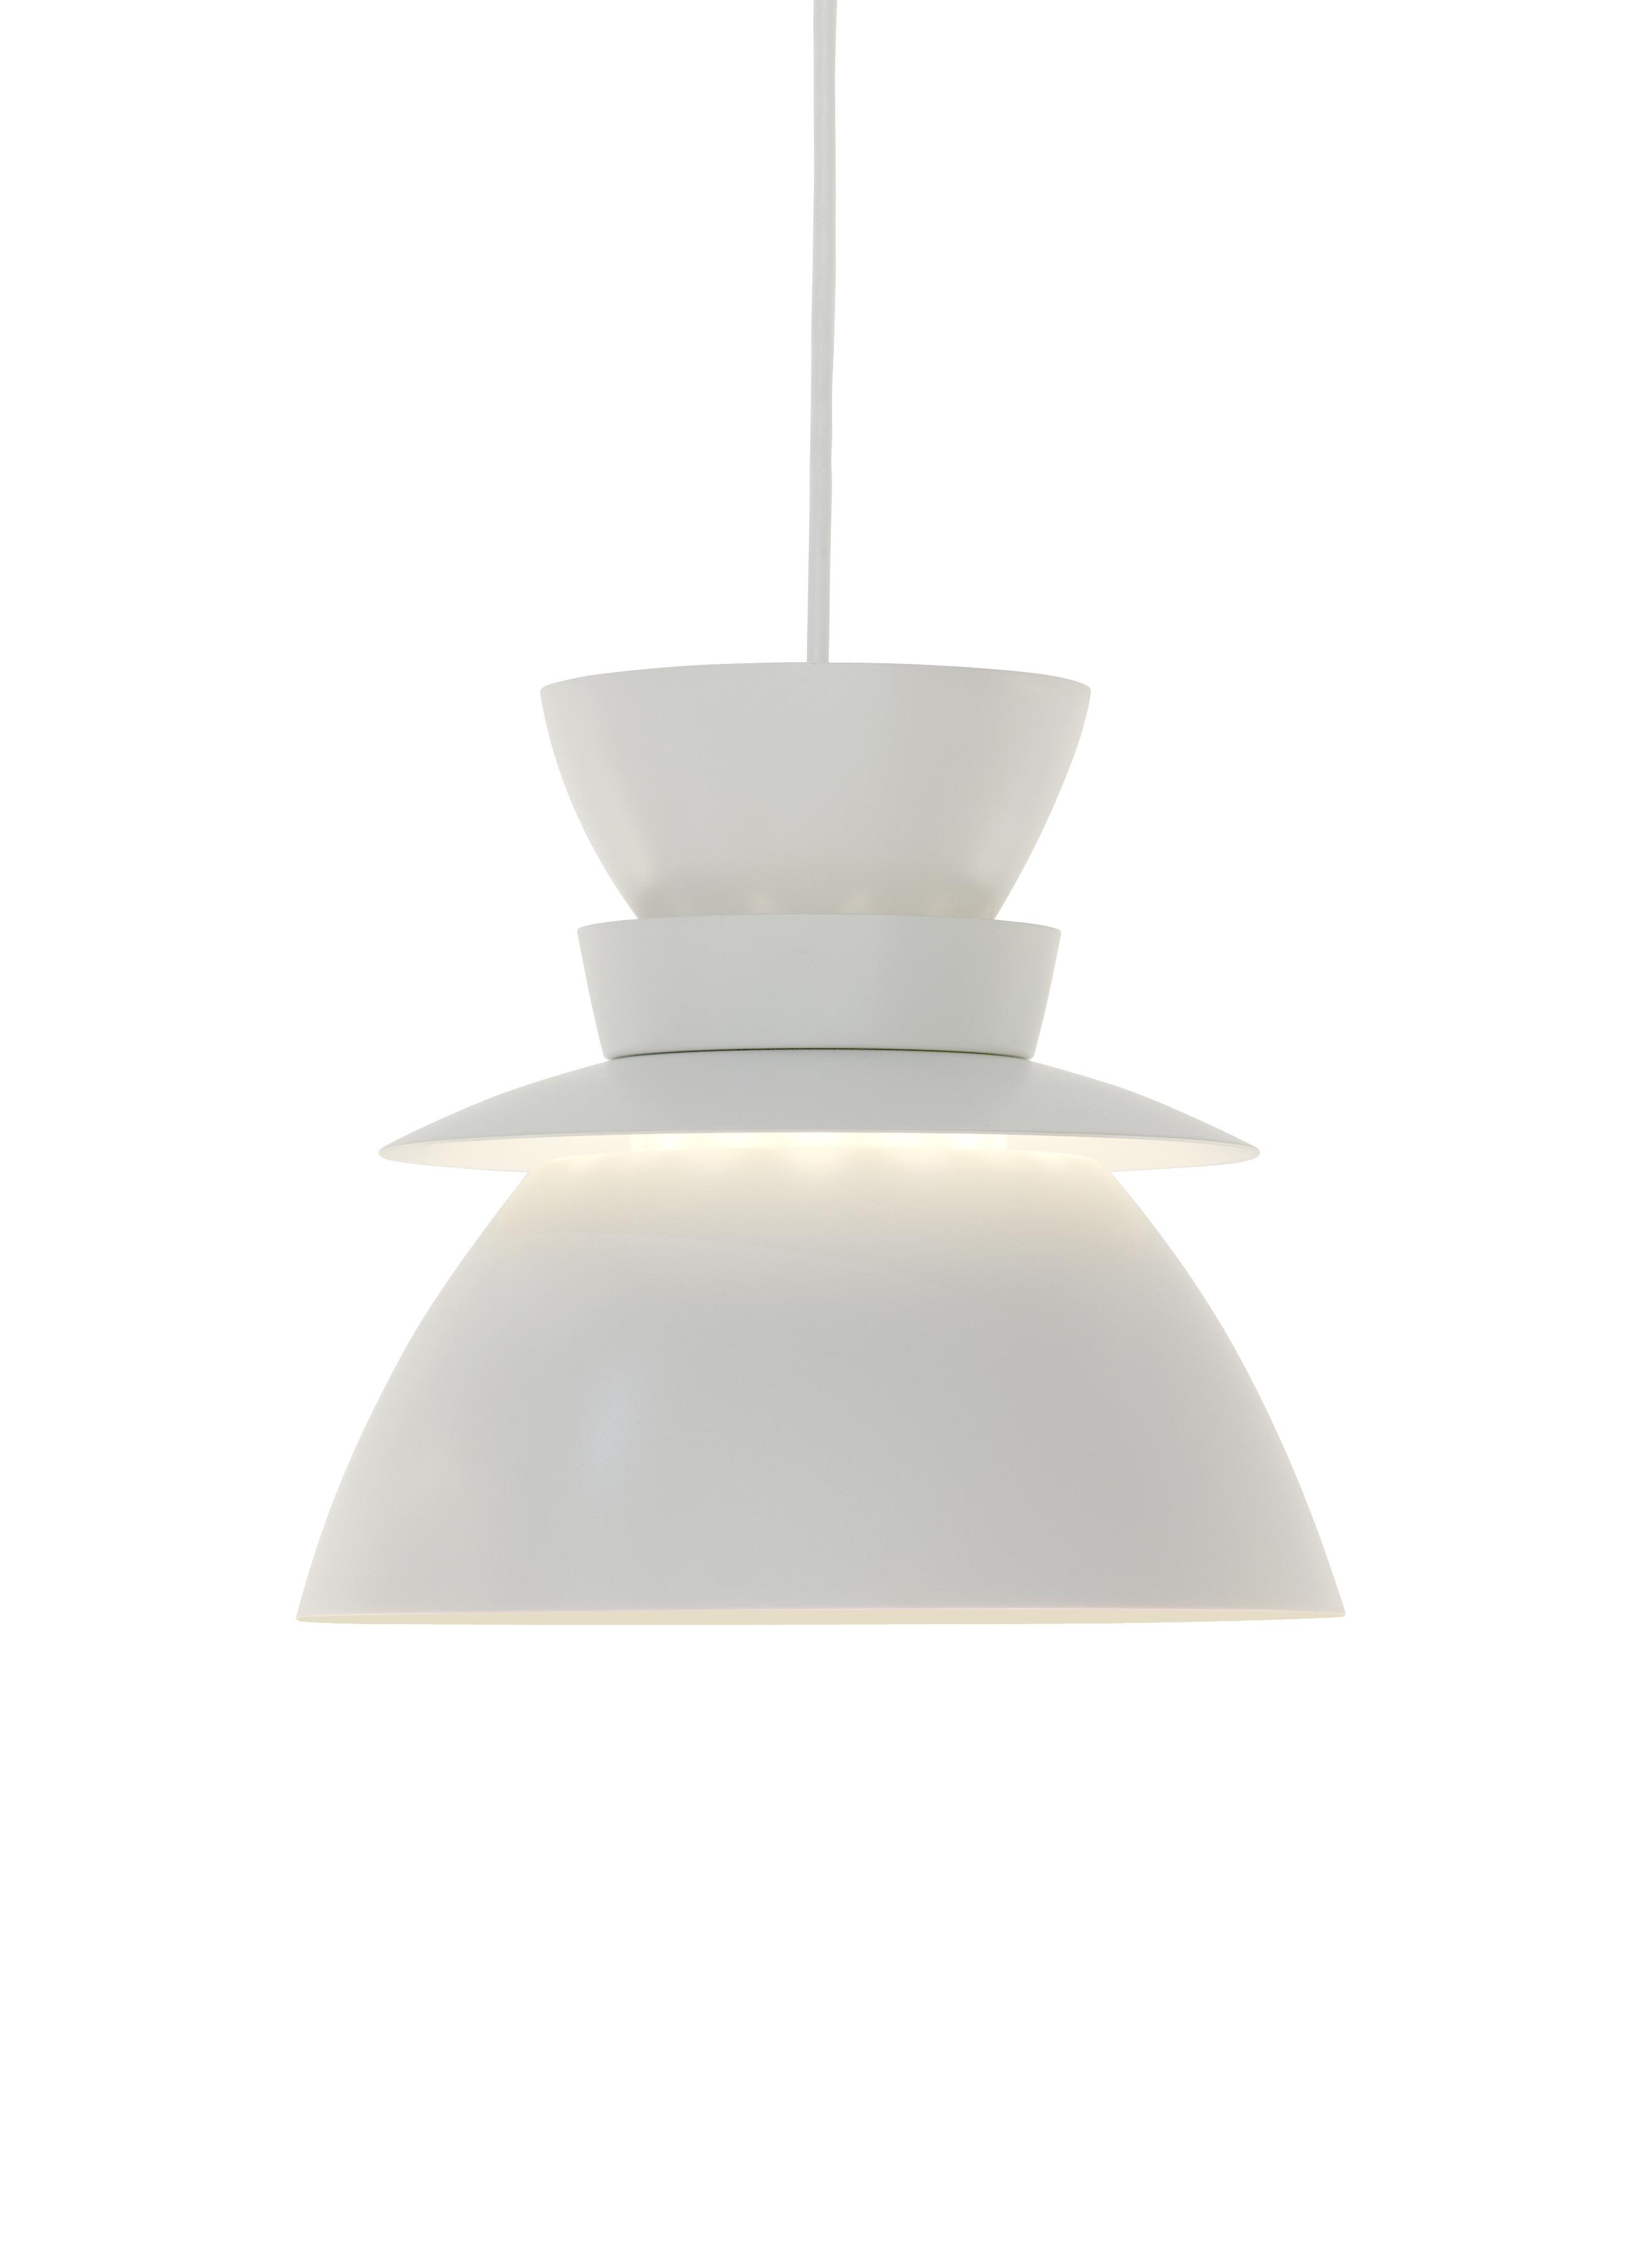 U336 Pendant Lamp by Jørn Utzon for Artek